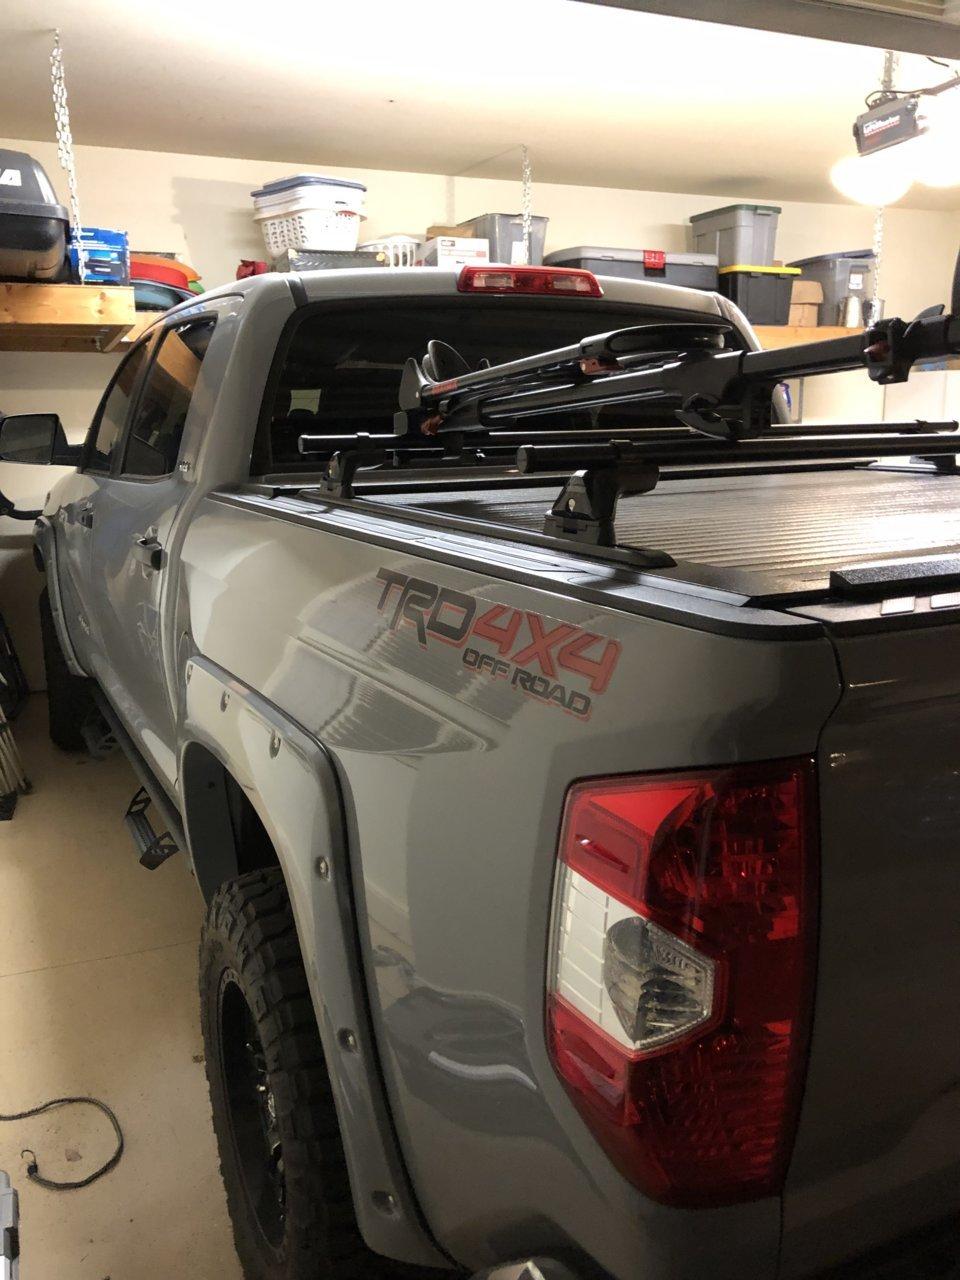 2019 Cement SR5 Off-Road Build | Toyota Tundra Forum